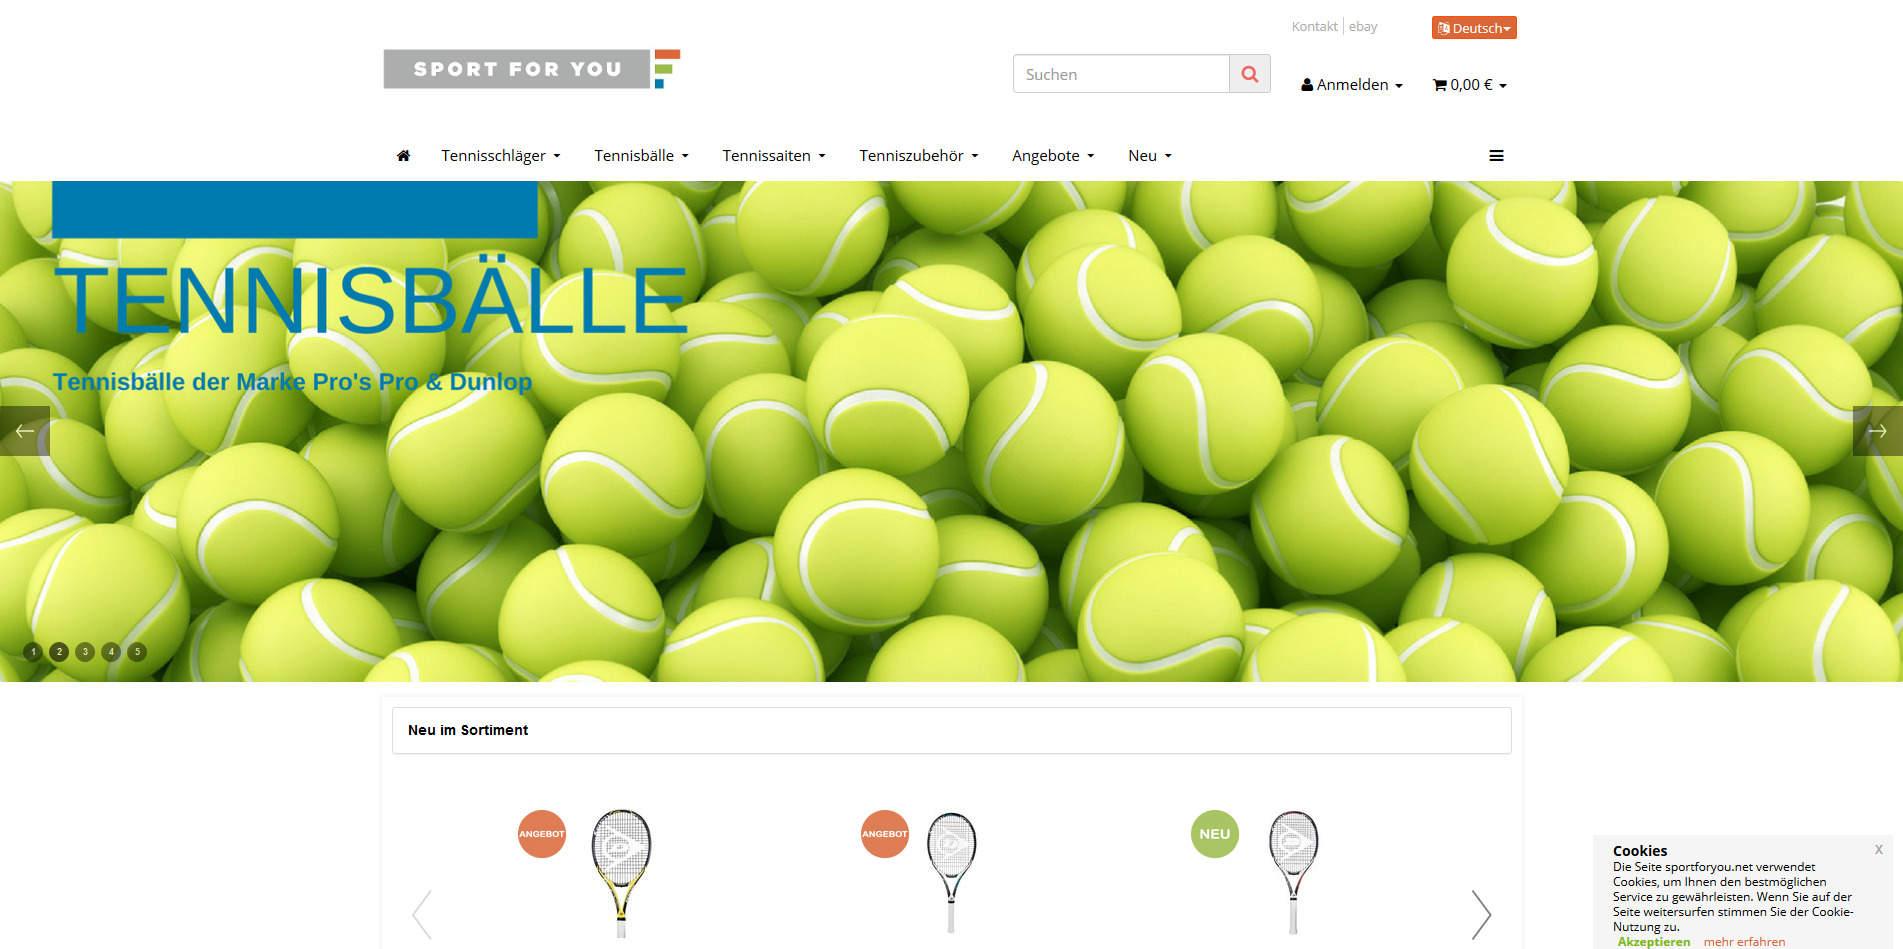 sportforyou.net